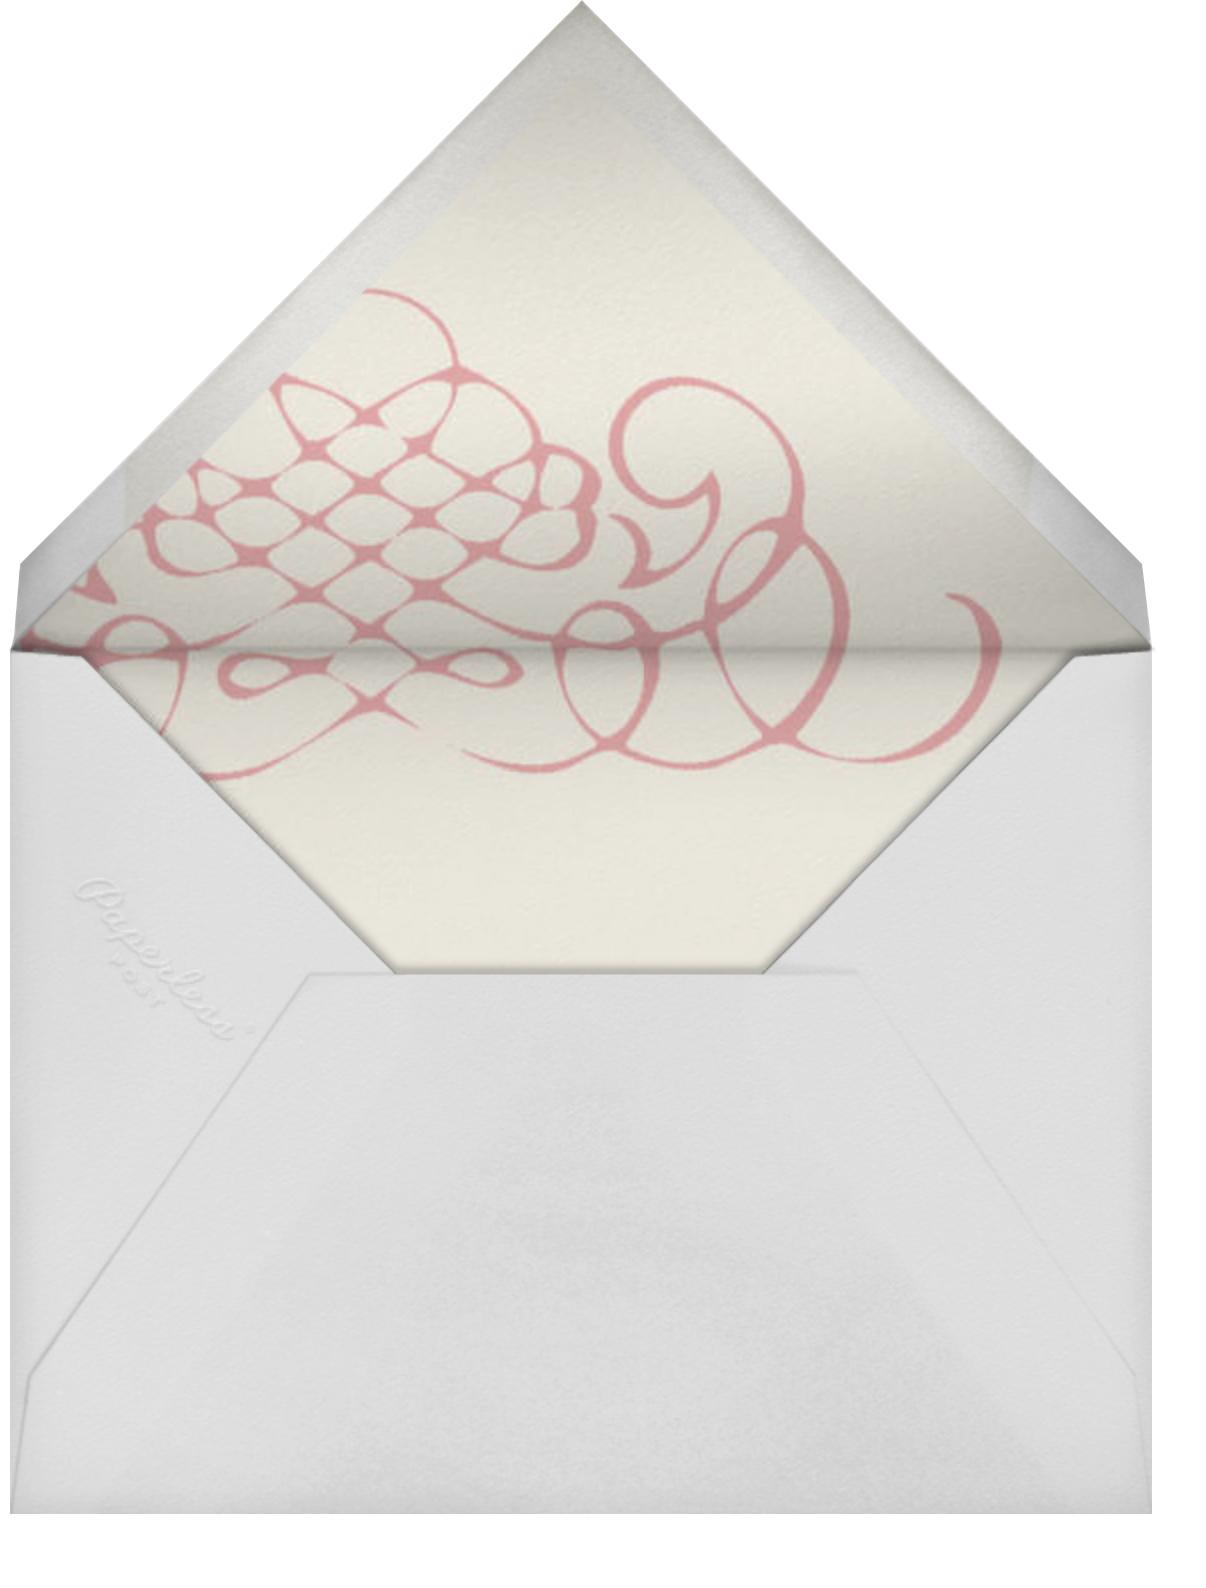 Edge Stain - Navy Tall - Paperless Post - null - envelope back